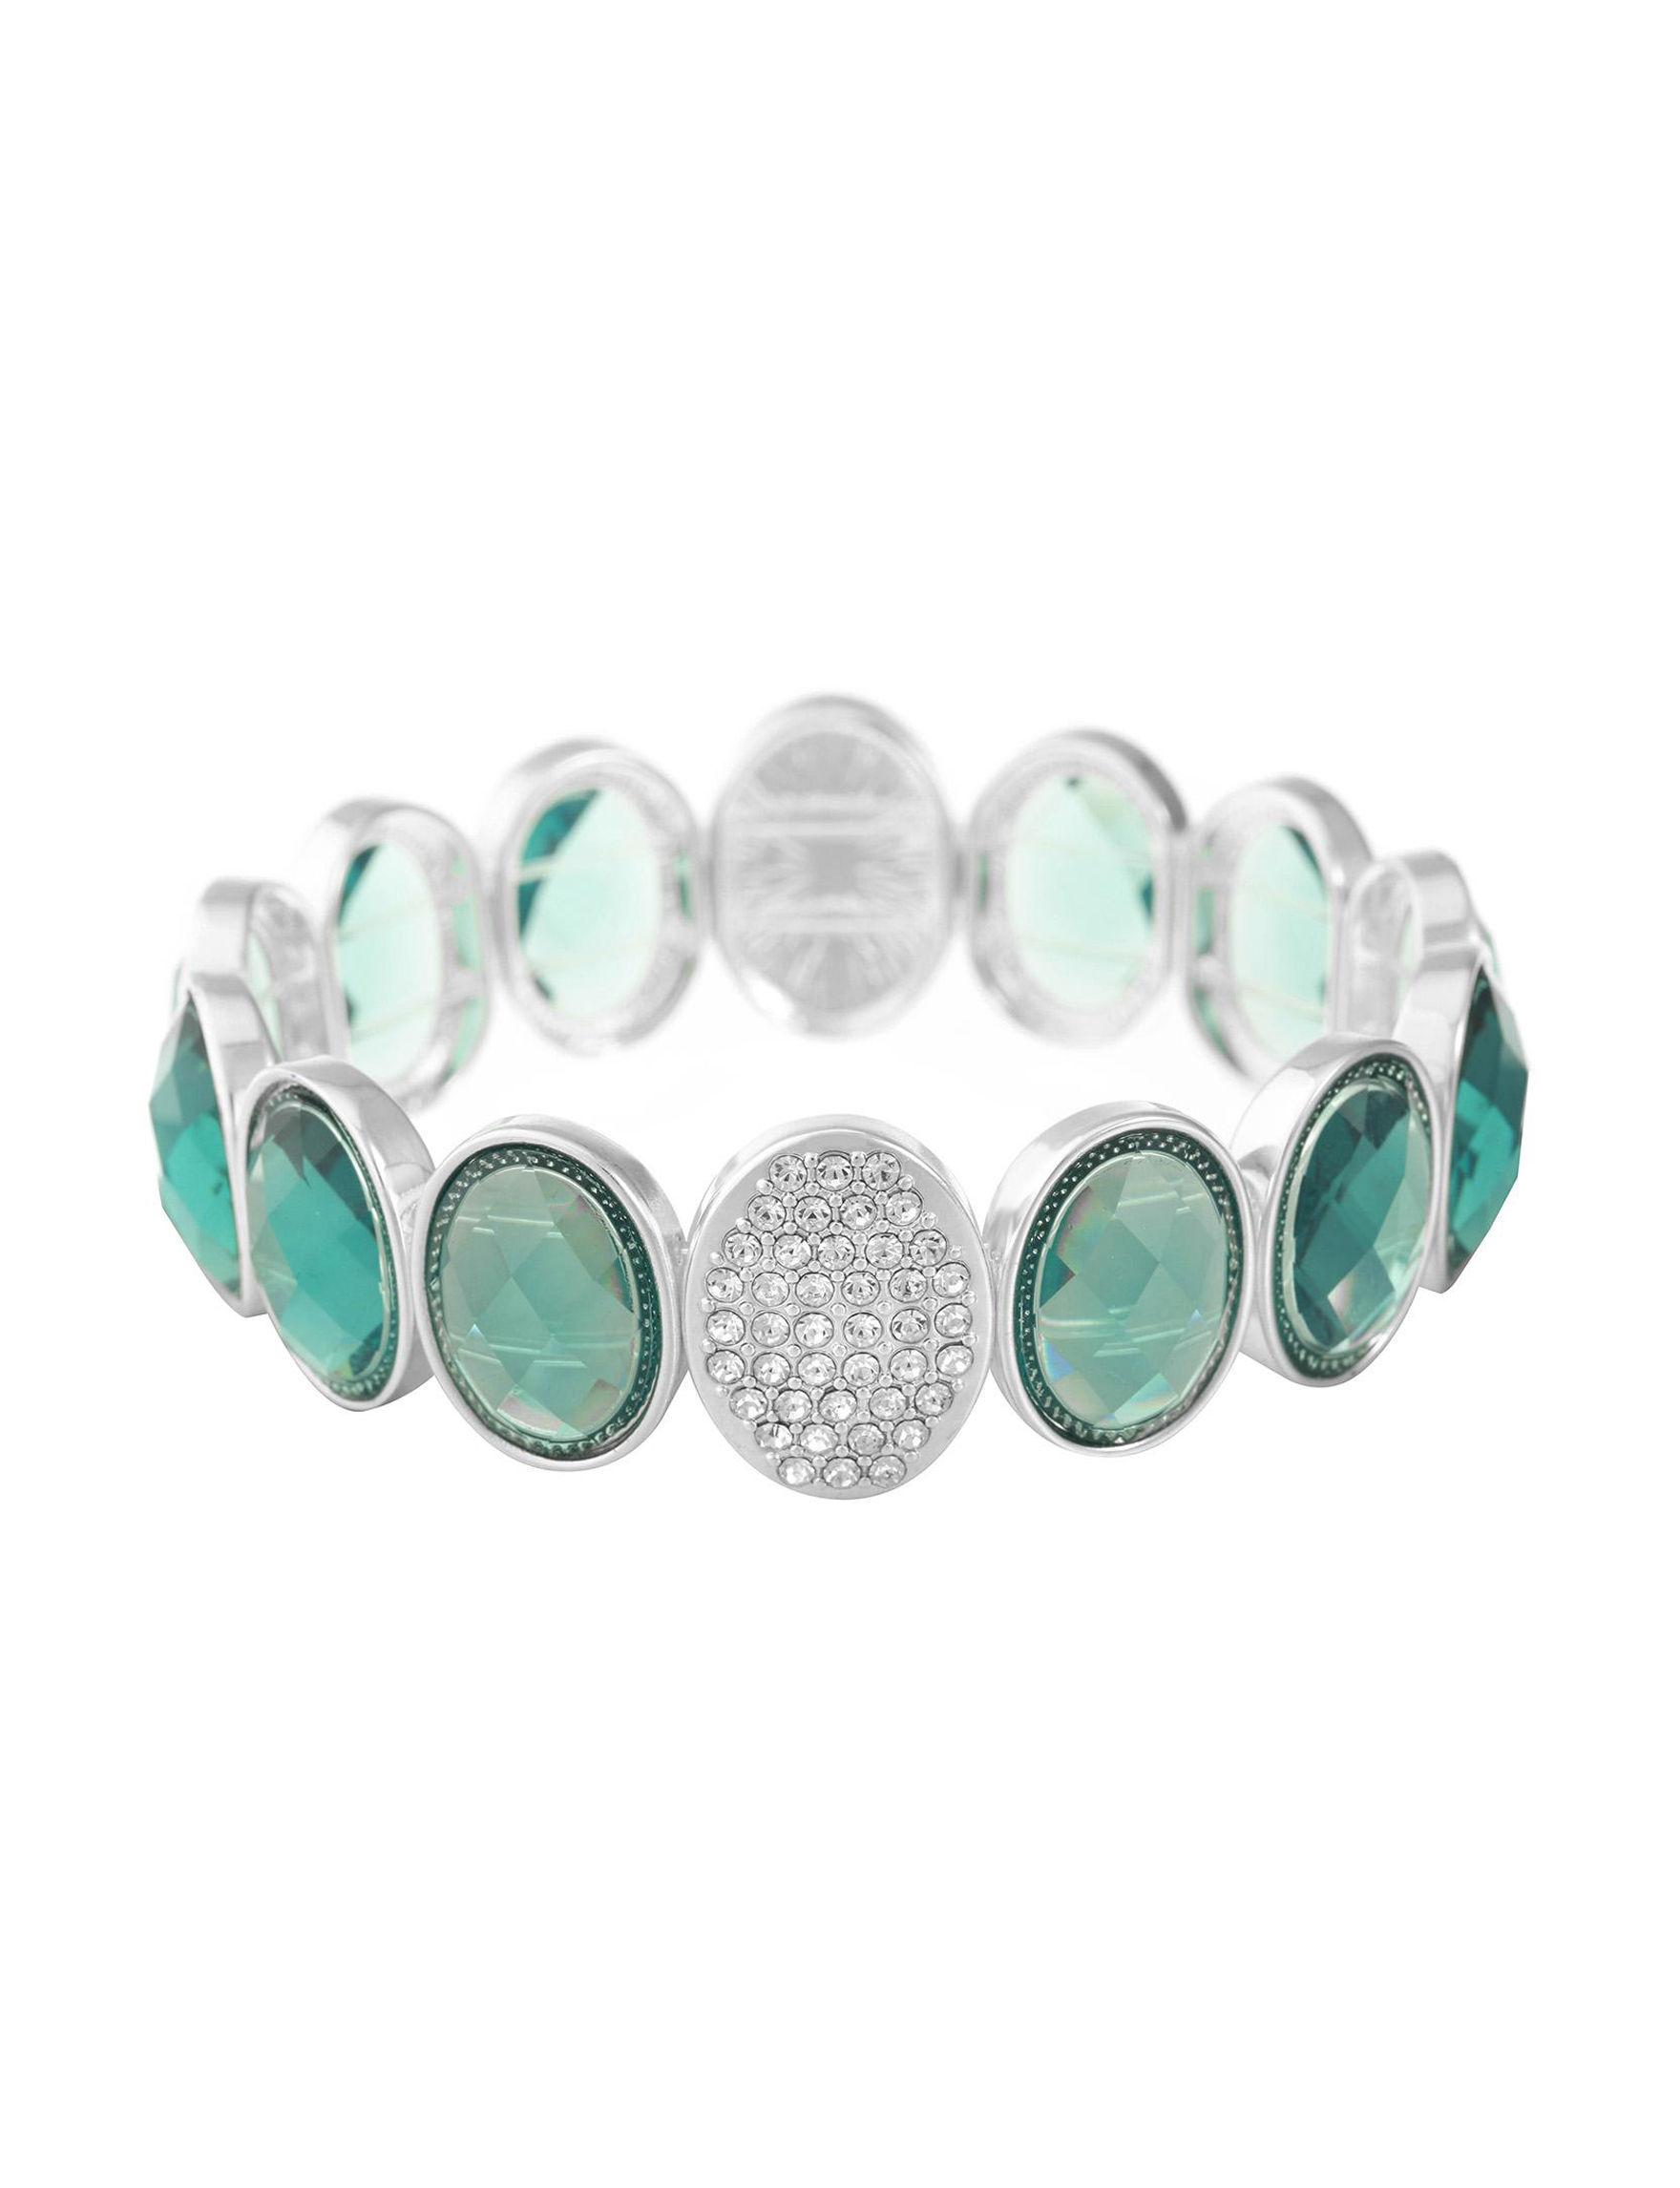 Gloria Vanderbilt Silver / Aqua Stone Bracelets Fashion Jewelry